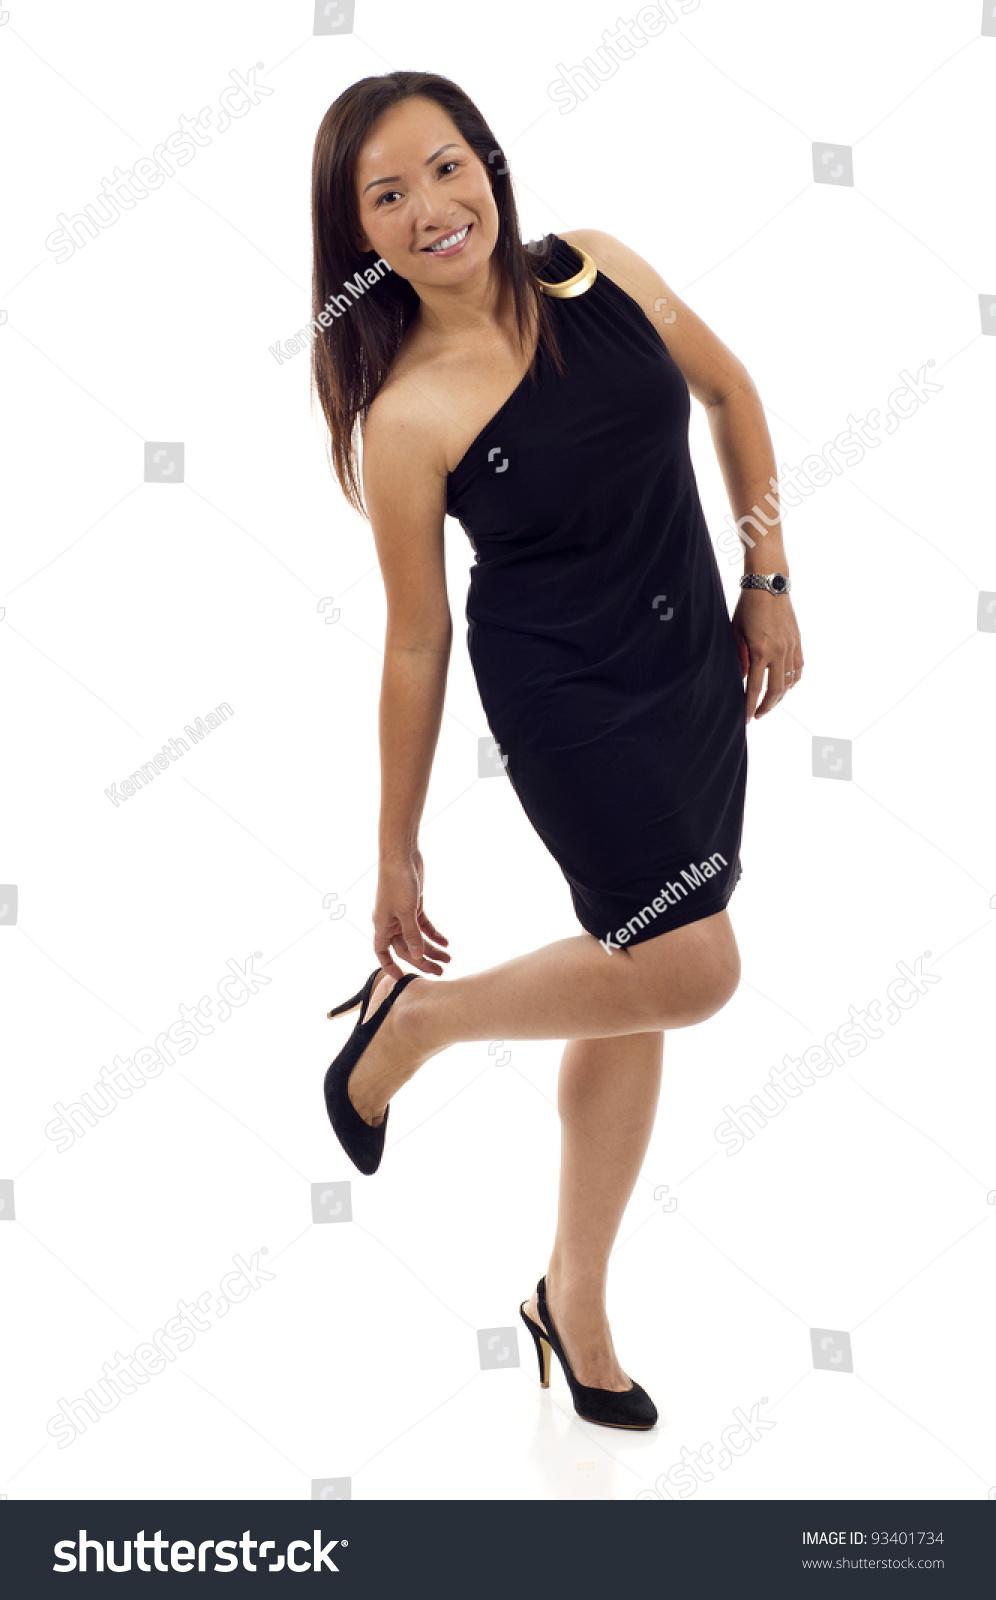 Japanese woman putting on tight brack bodysuit - 2 8